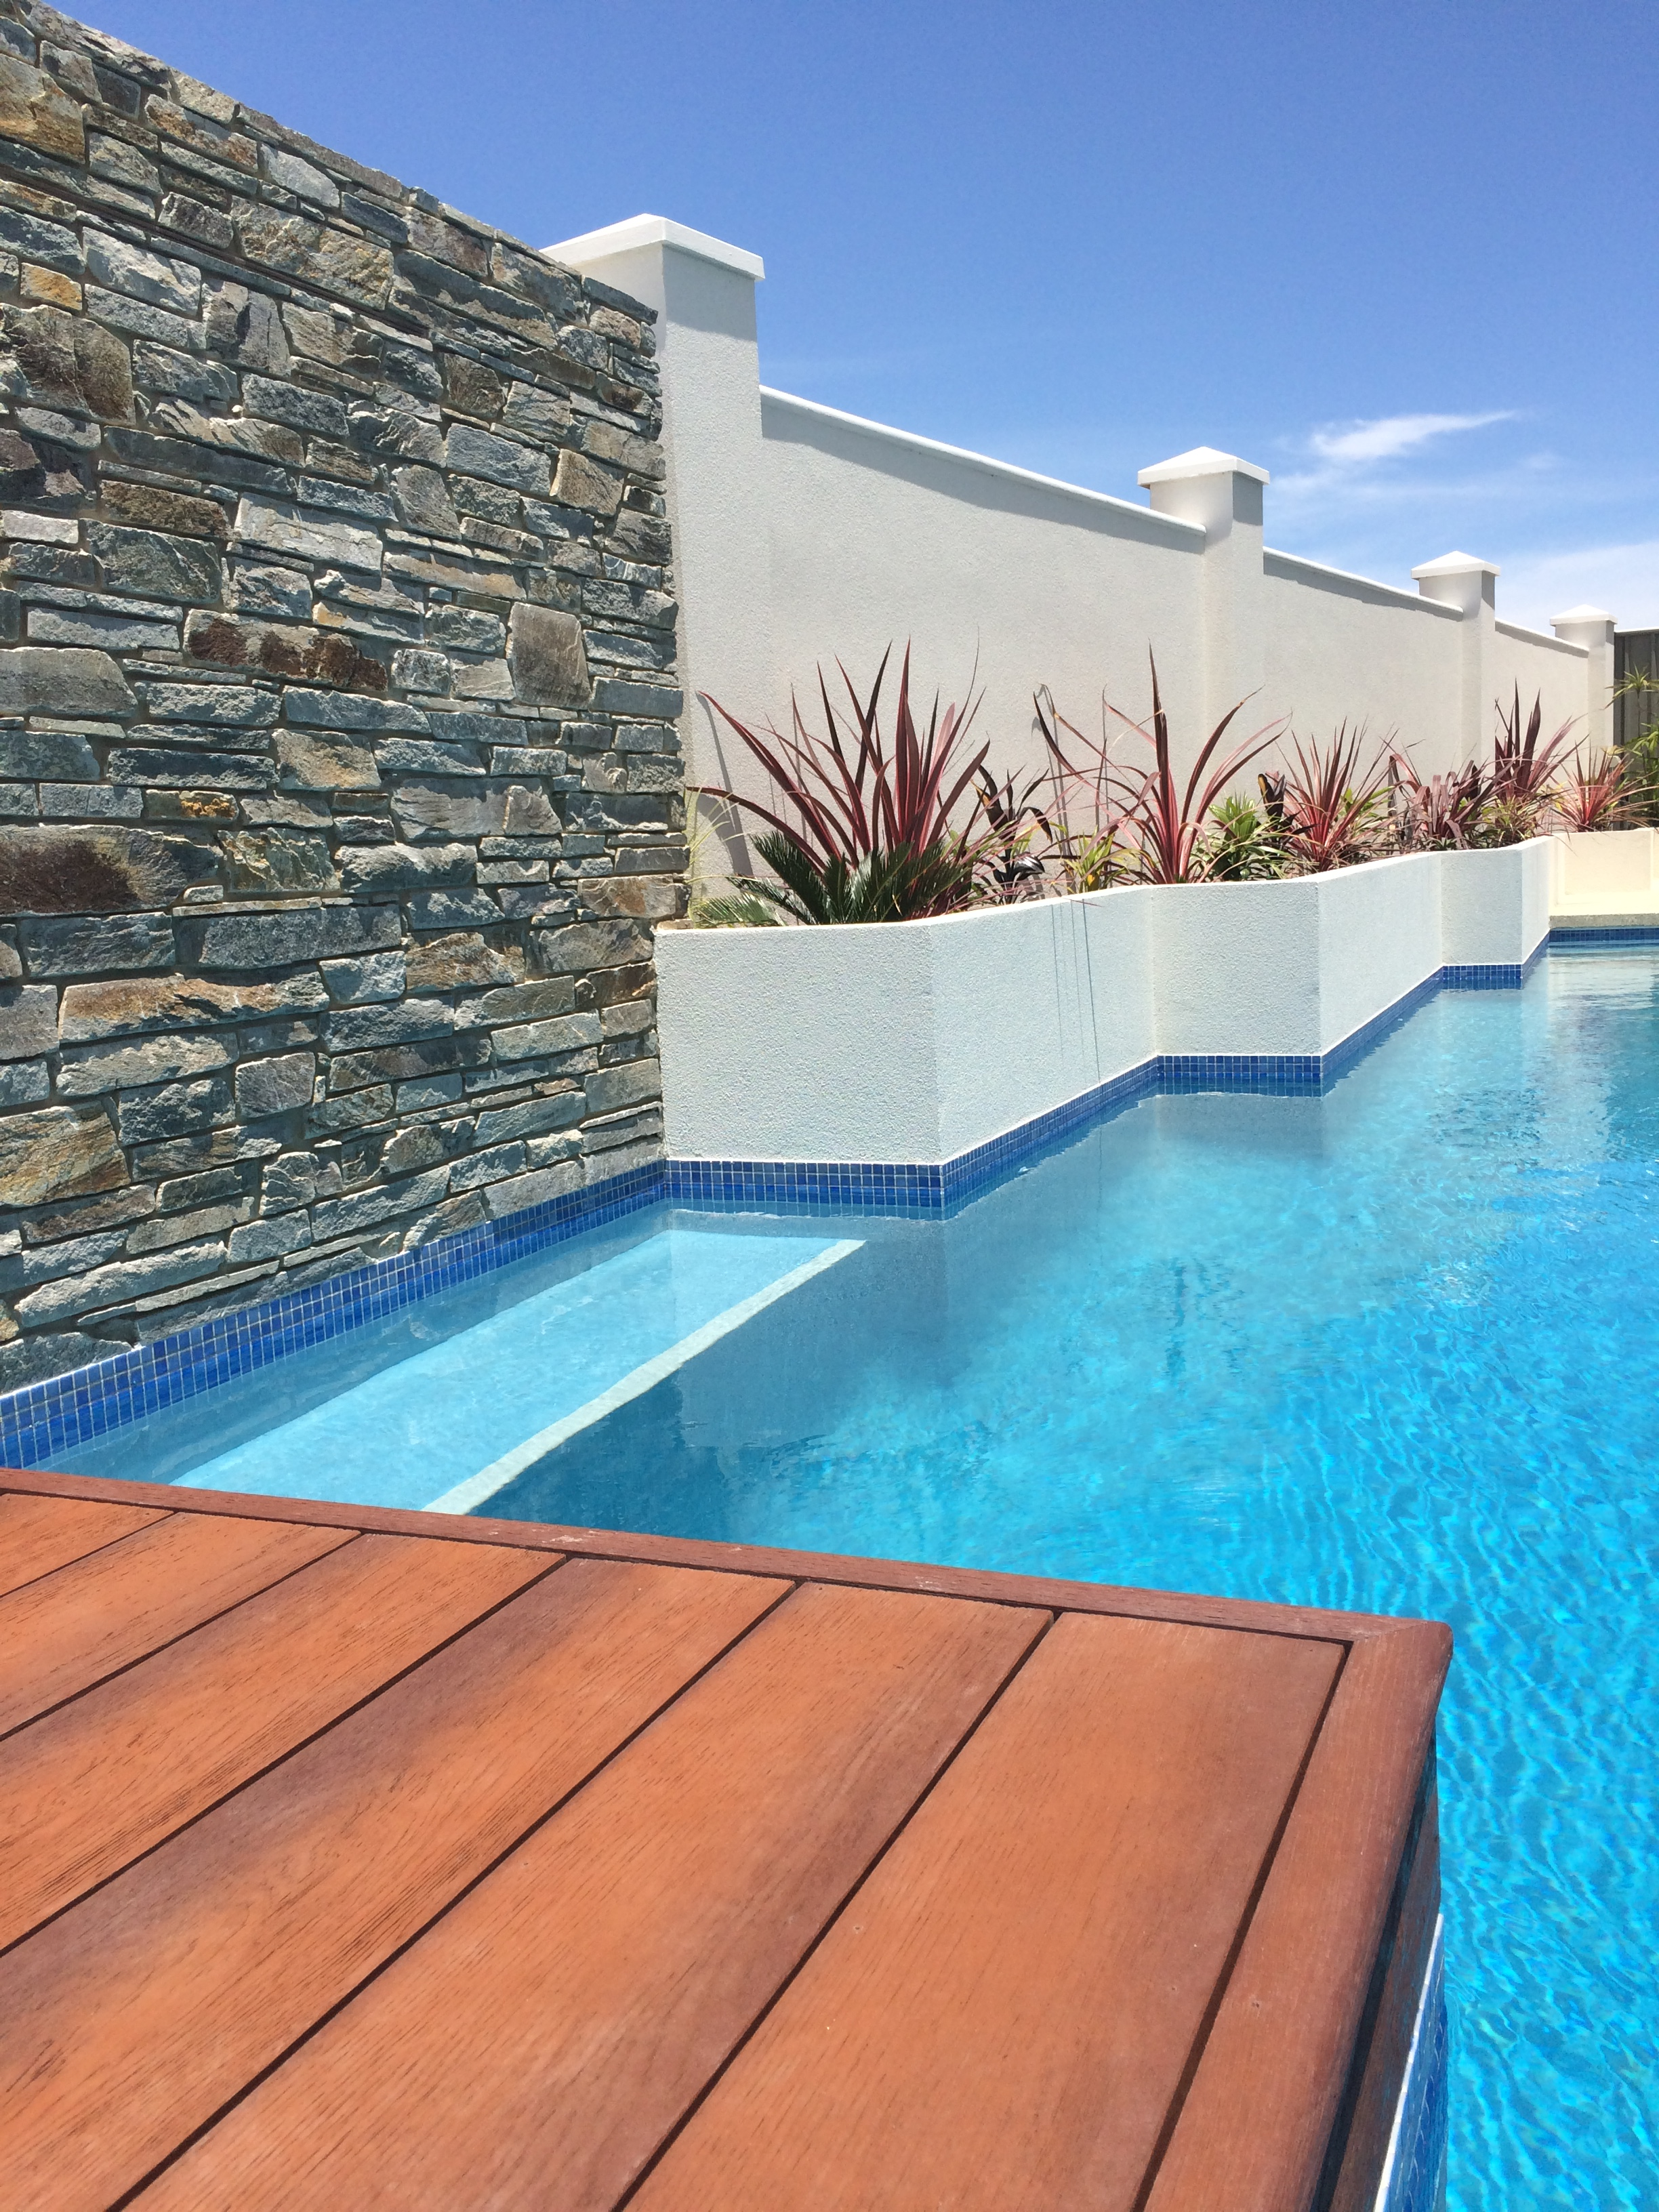 Gallery tropical pools perth best swimming pool designs for Pool design perth